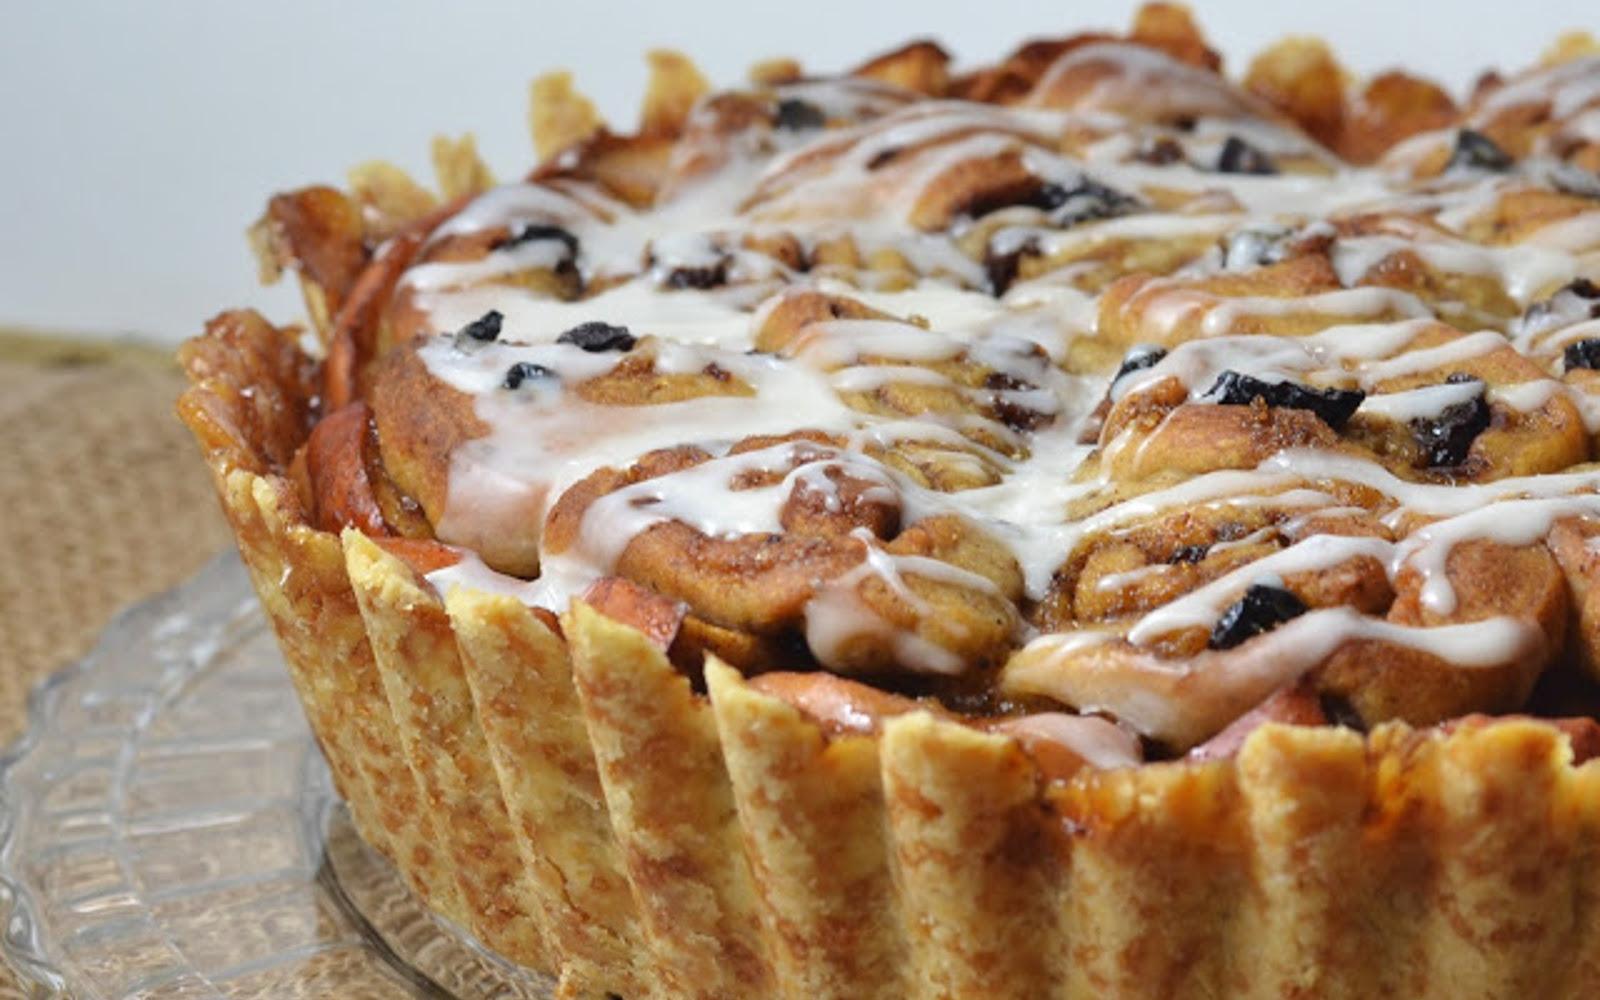 Sourdough Cinnamon Roll Deep Dish Apple Tart